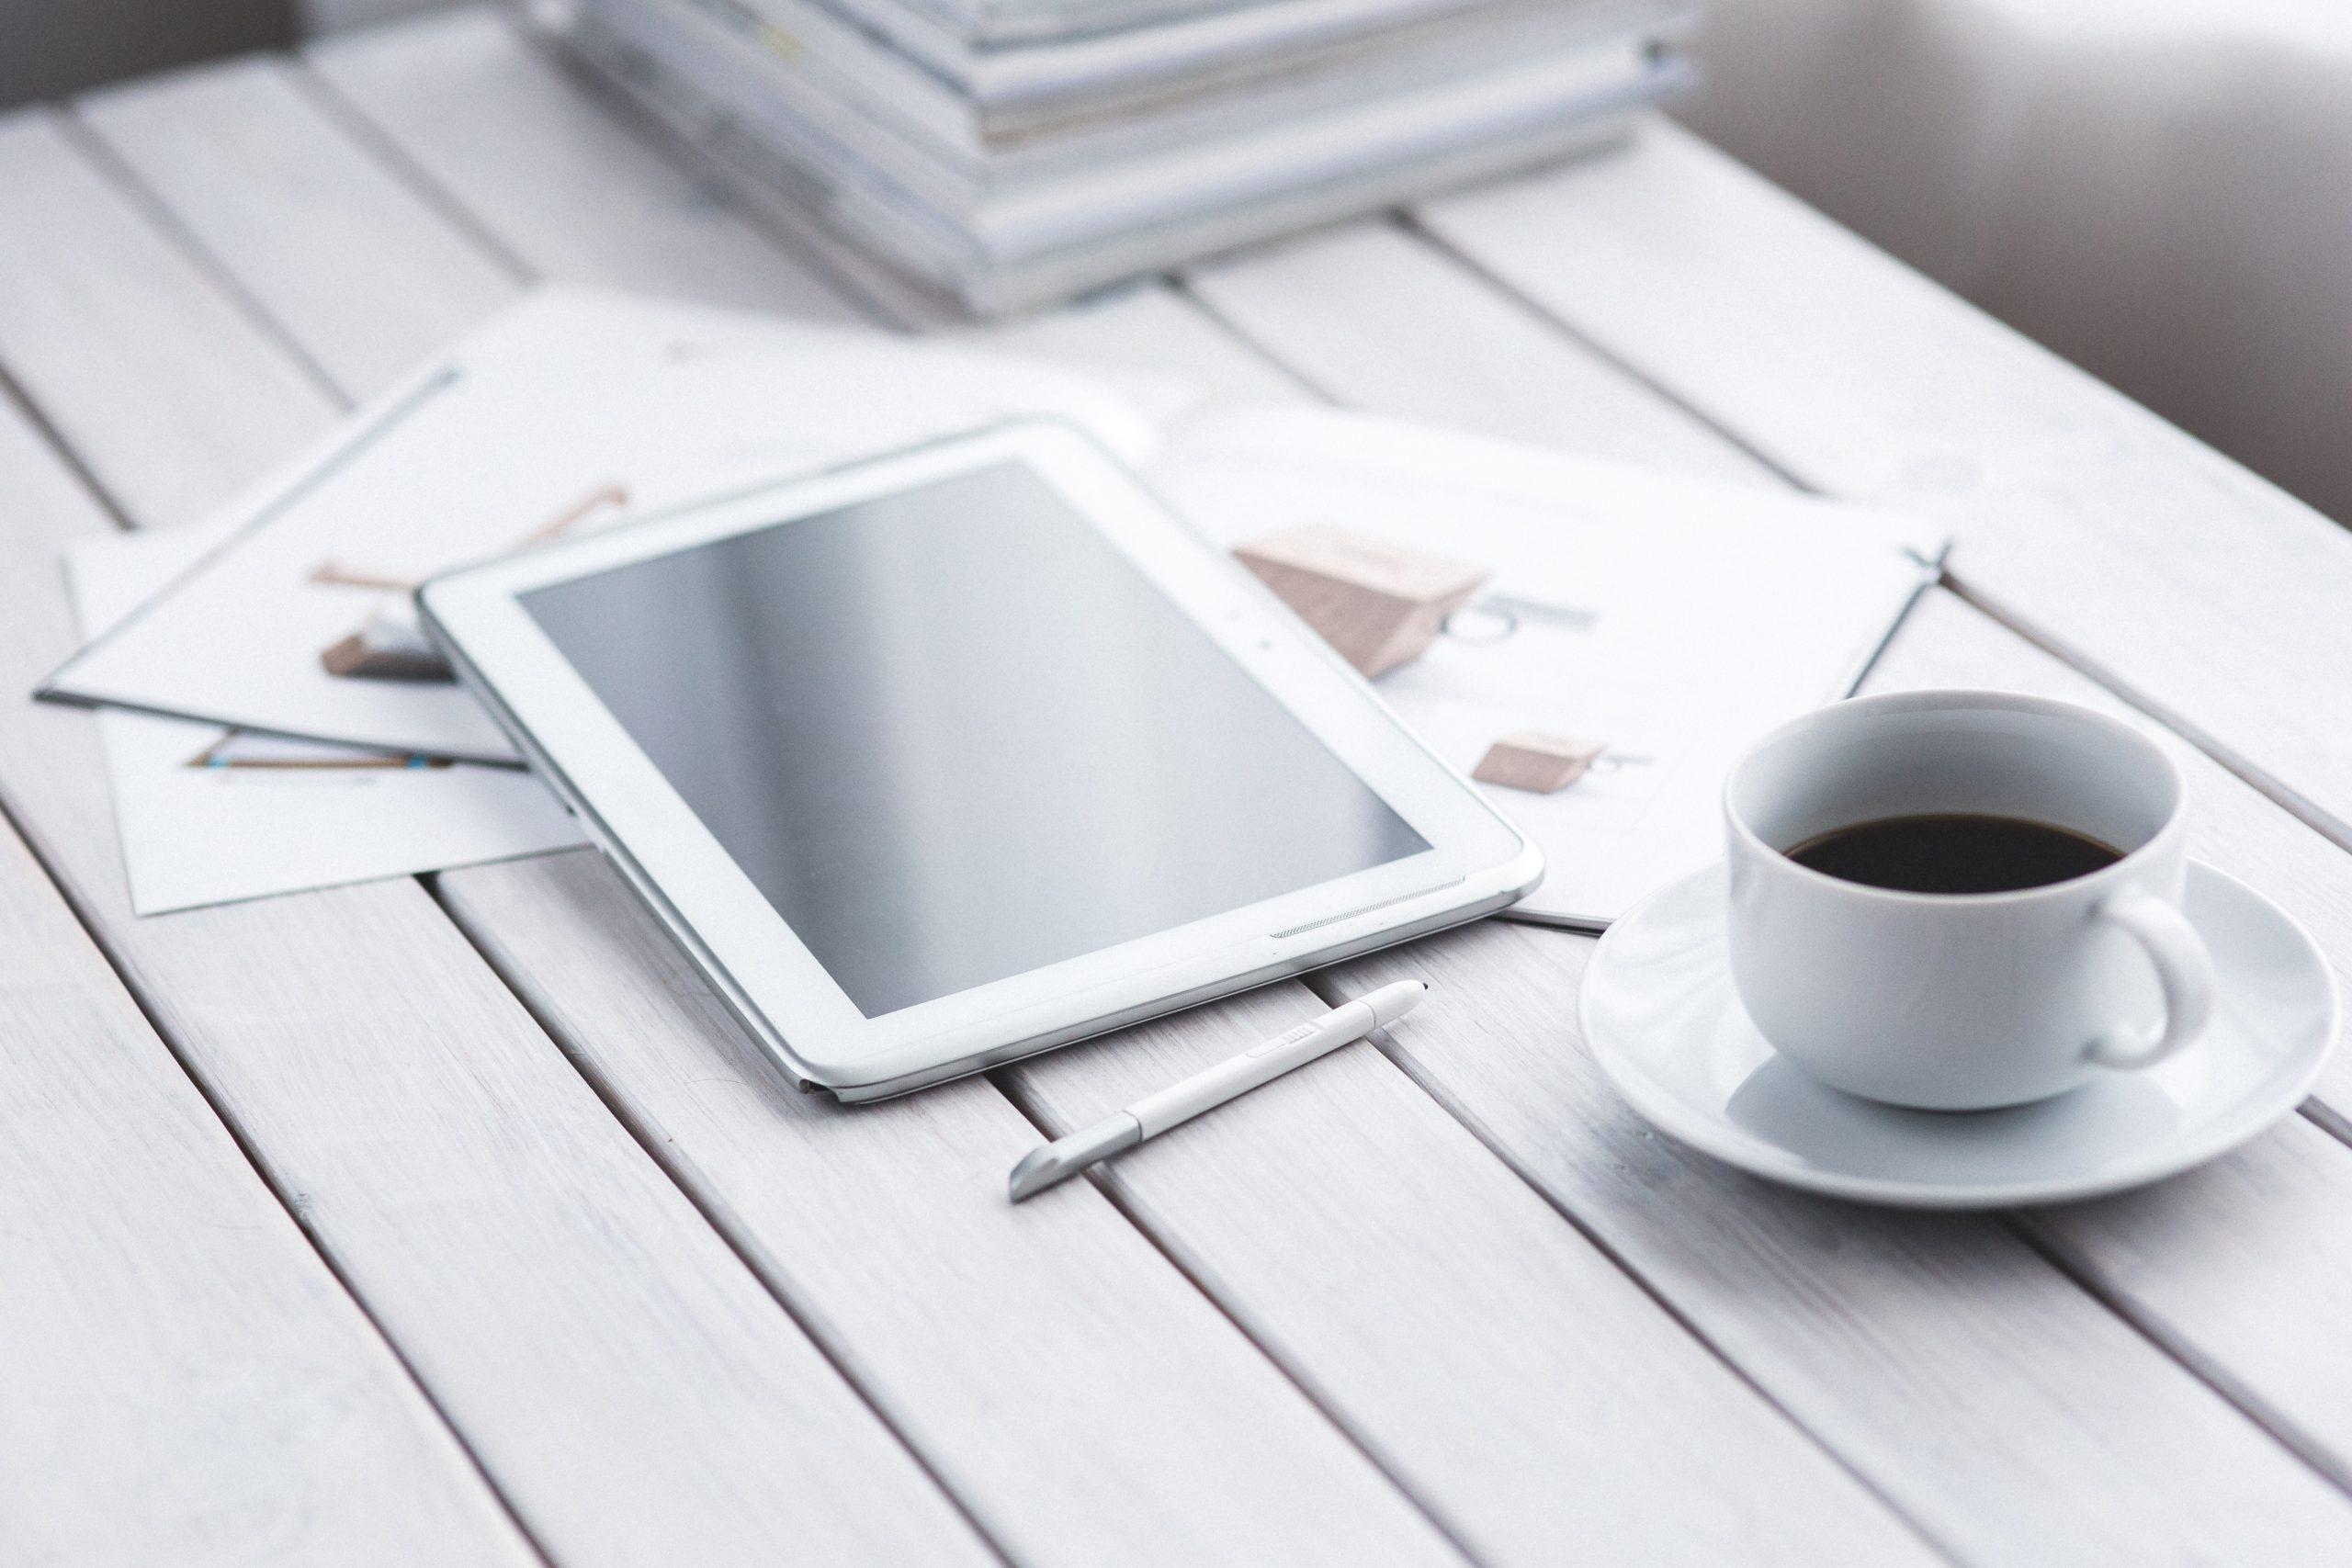 tablet café